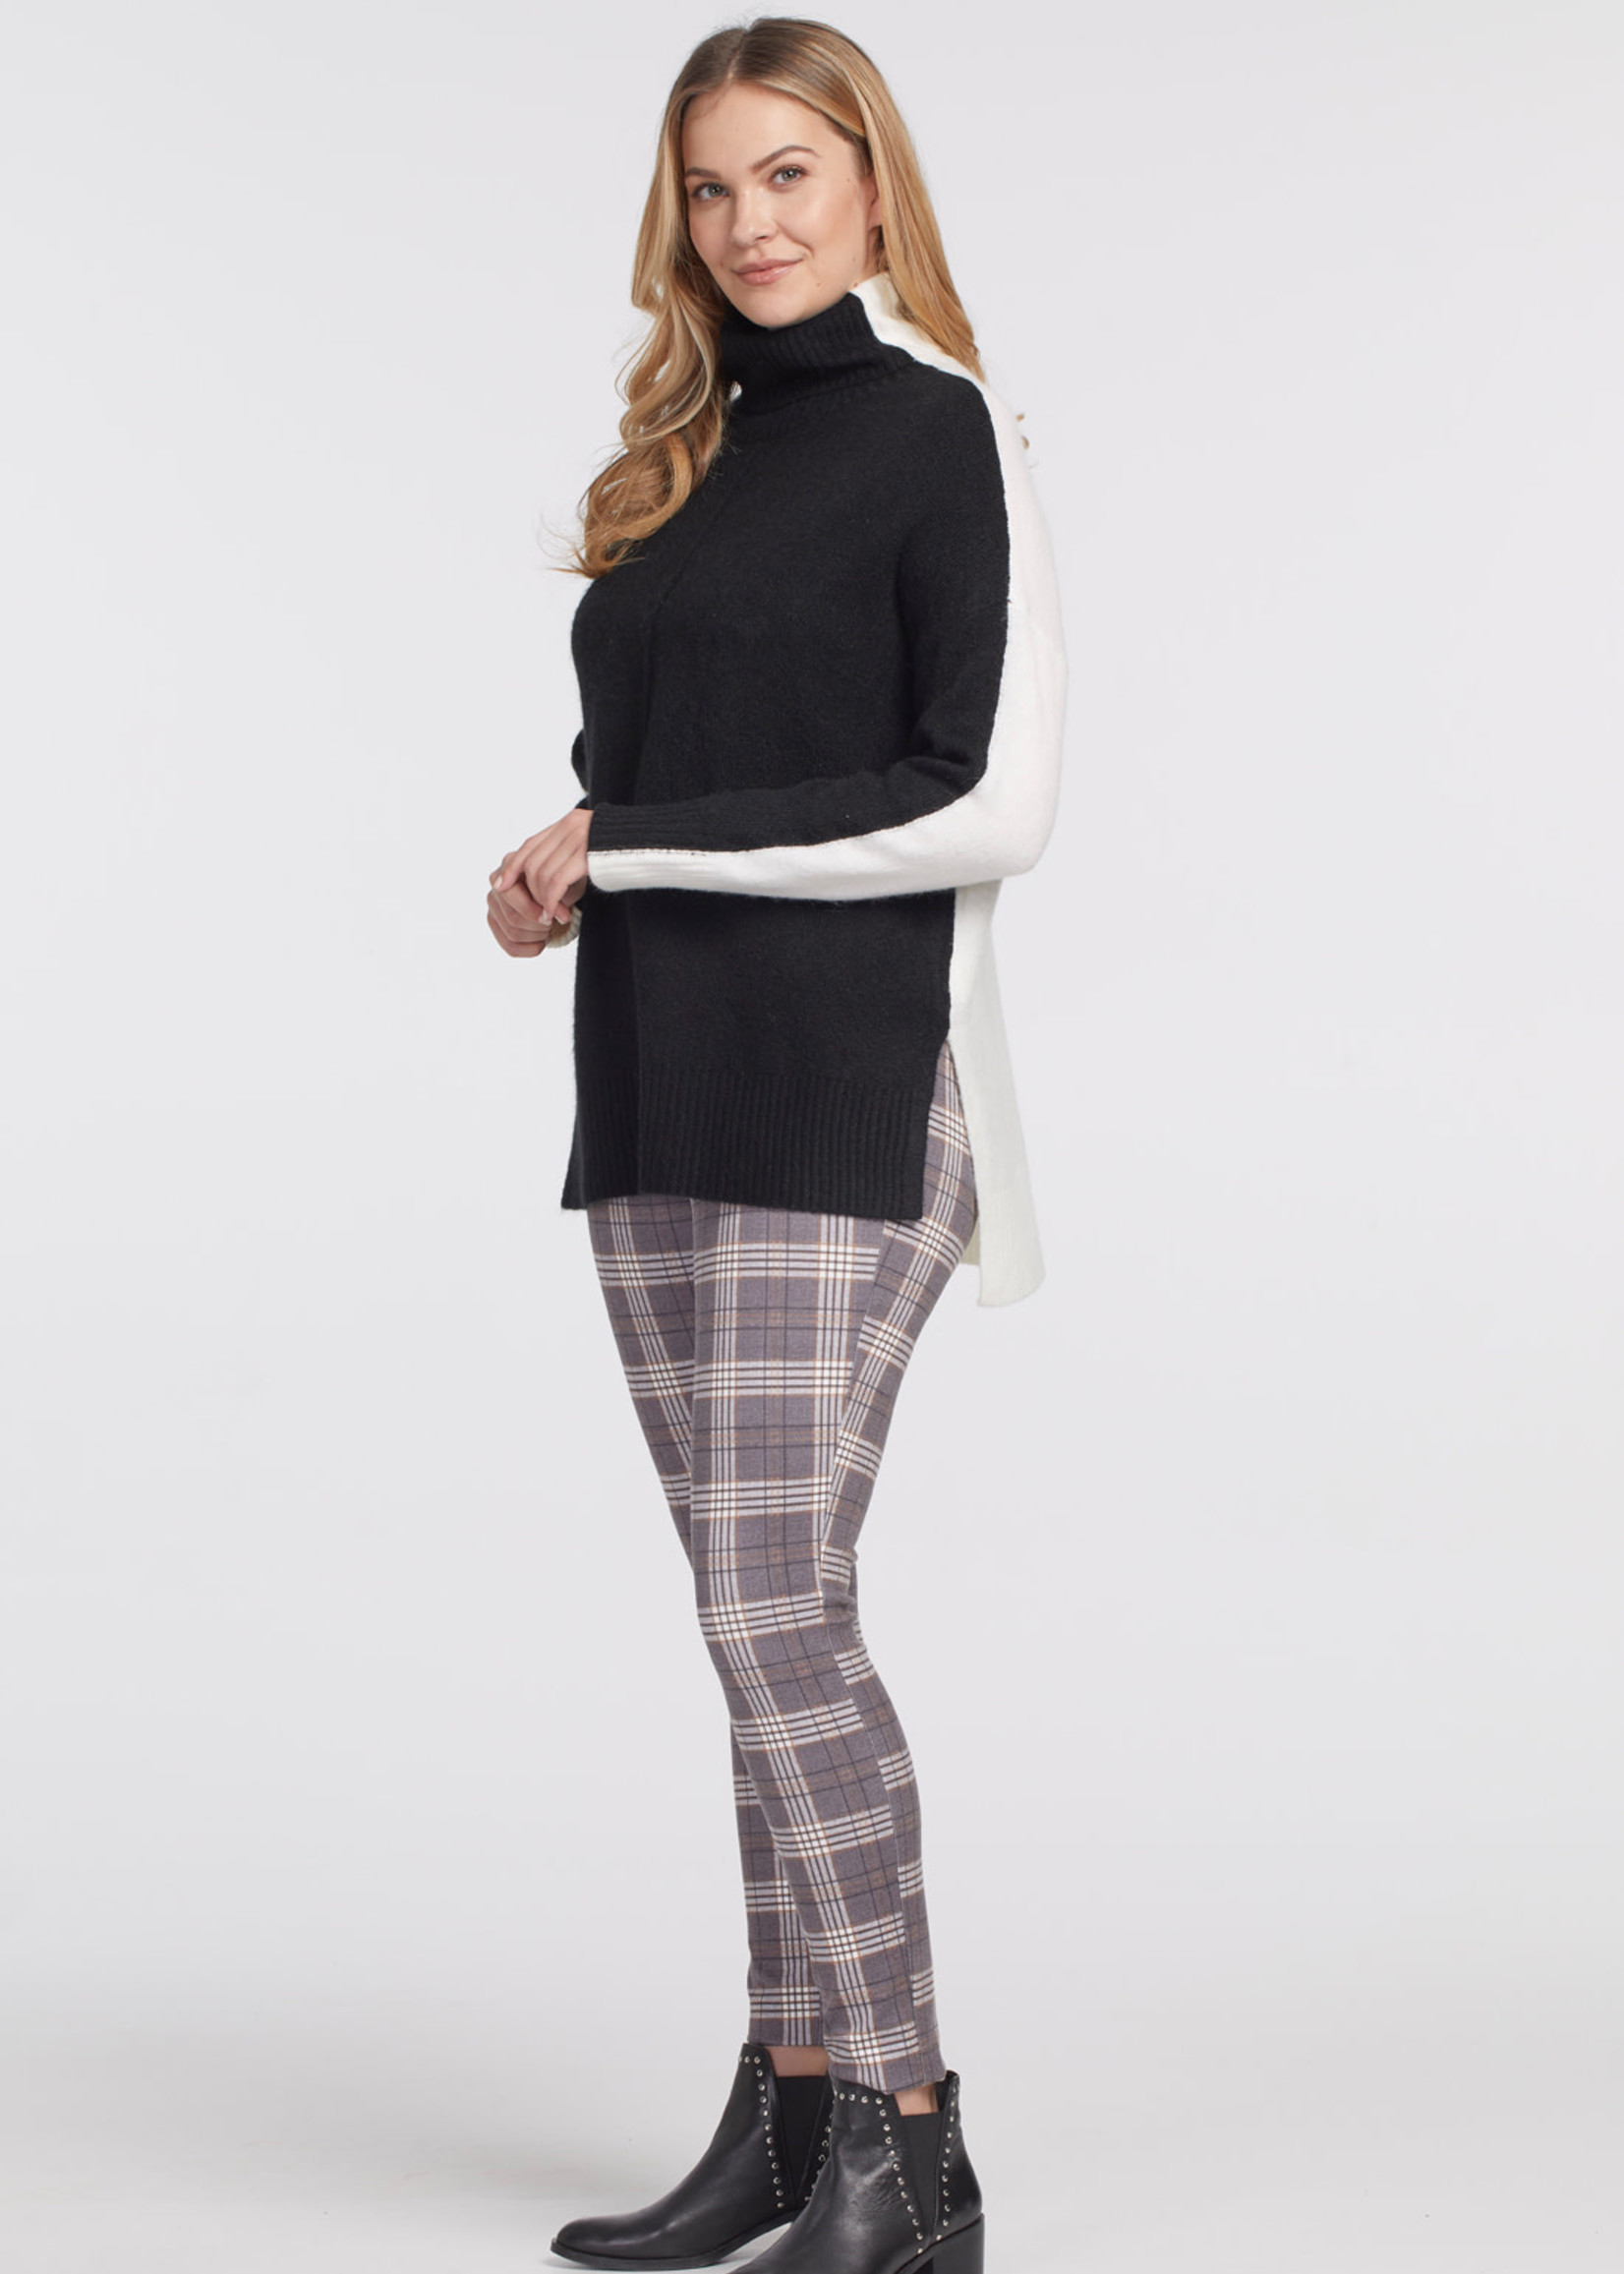 Tribal L/S Turtle Neck Color Block Sweater 43920/3166